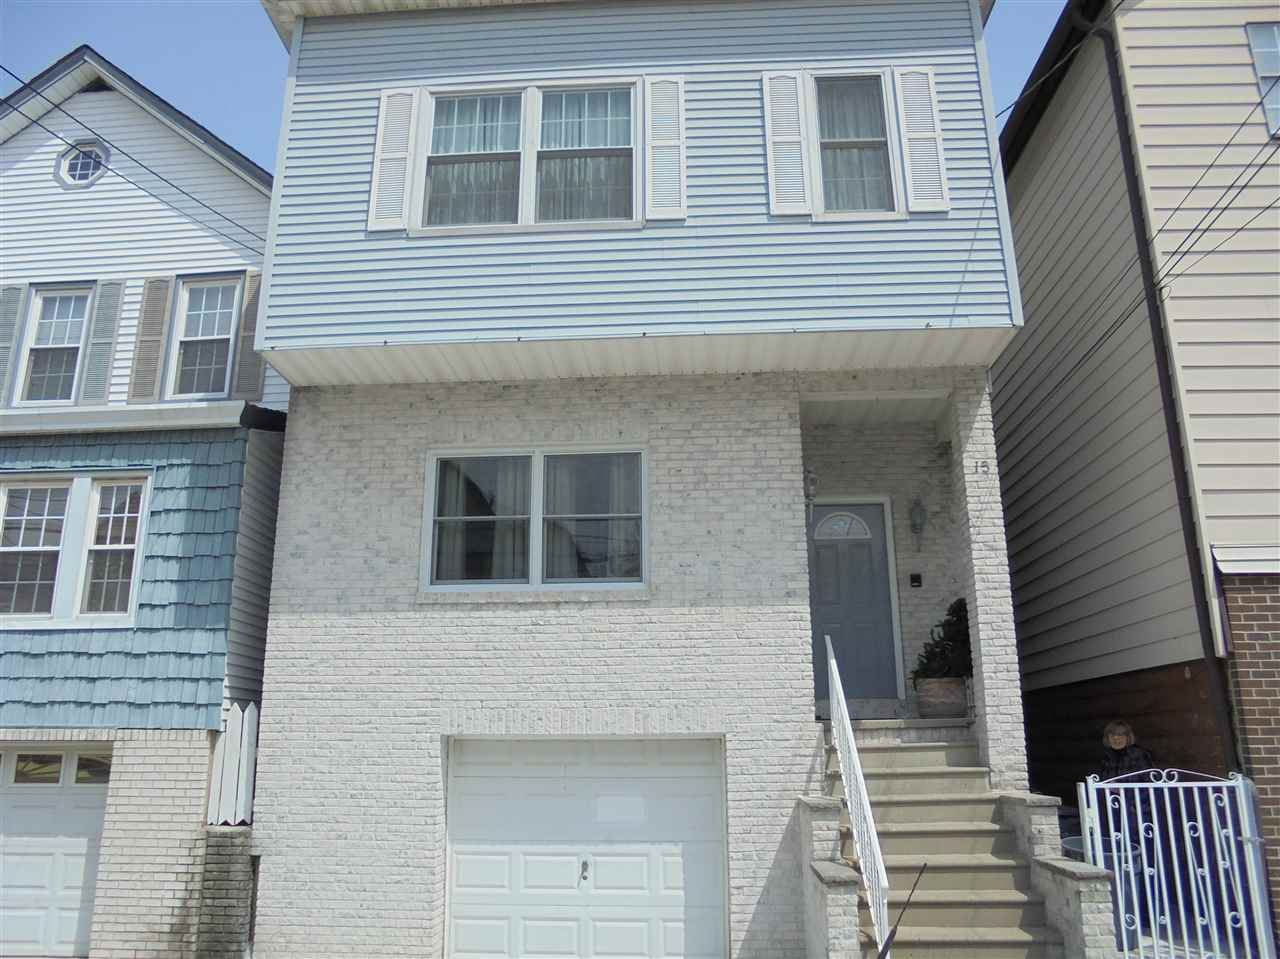 15 EAST 16TH ST, Bayonne, NJ 07002 - MLS#: 202013195